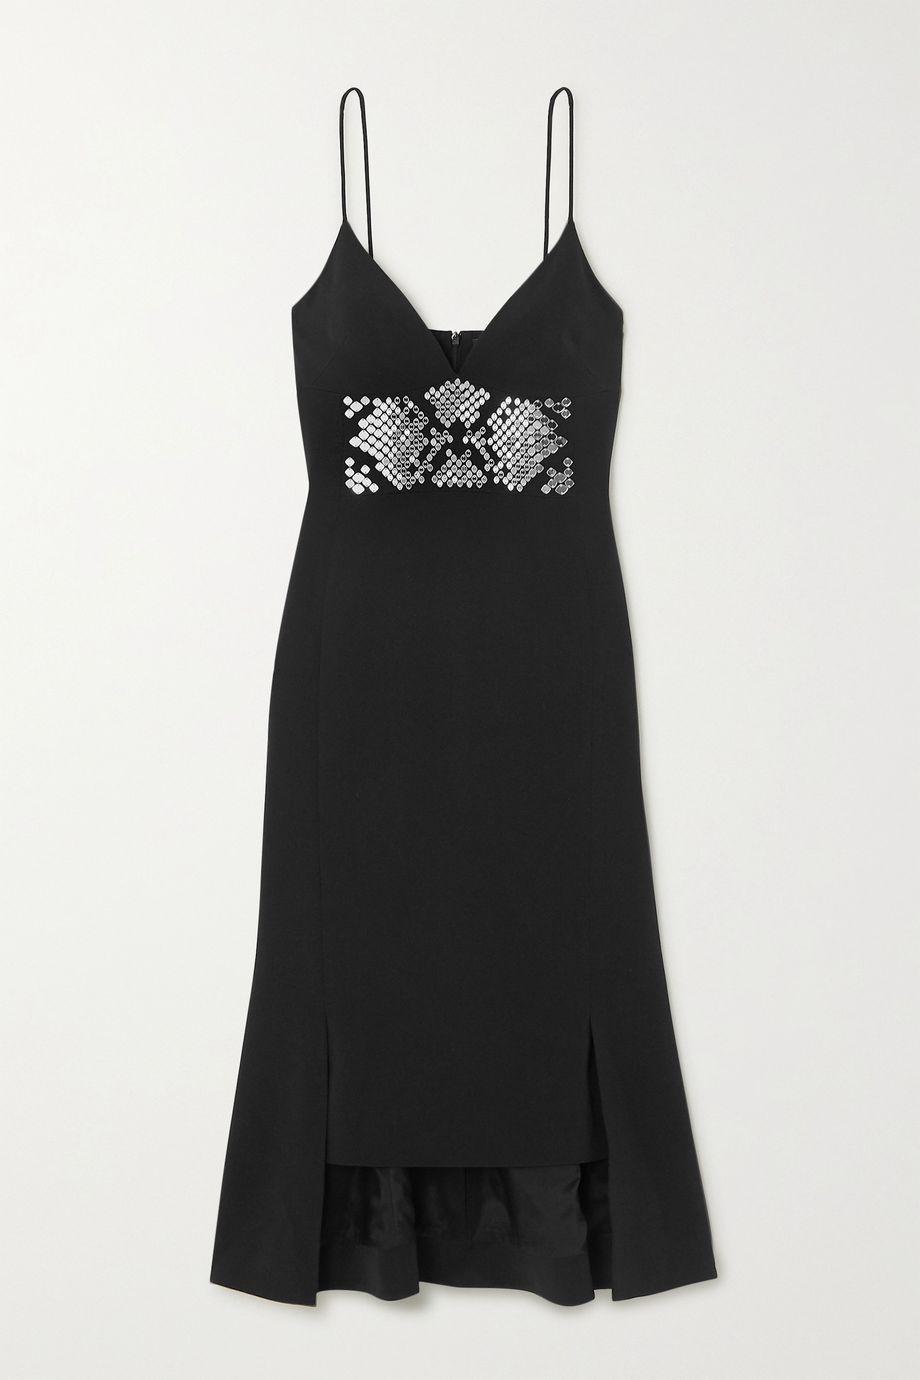 David Koma Asymmetric embellished crepe midi dress